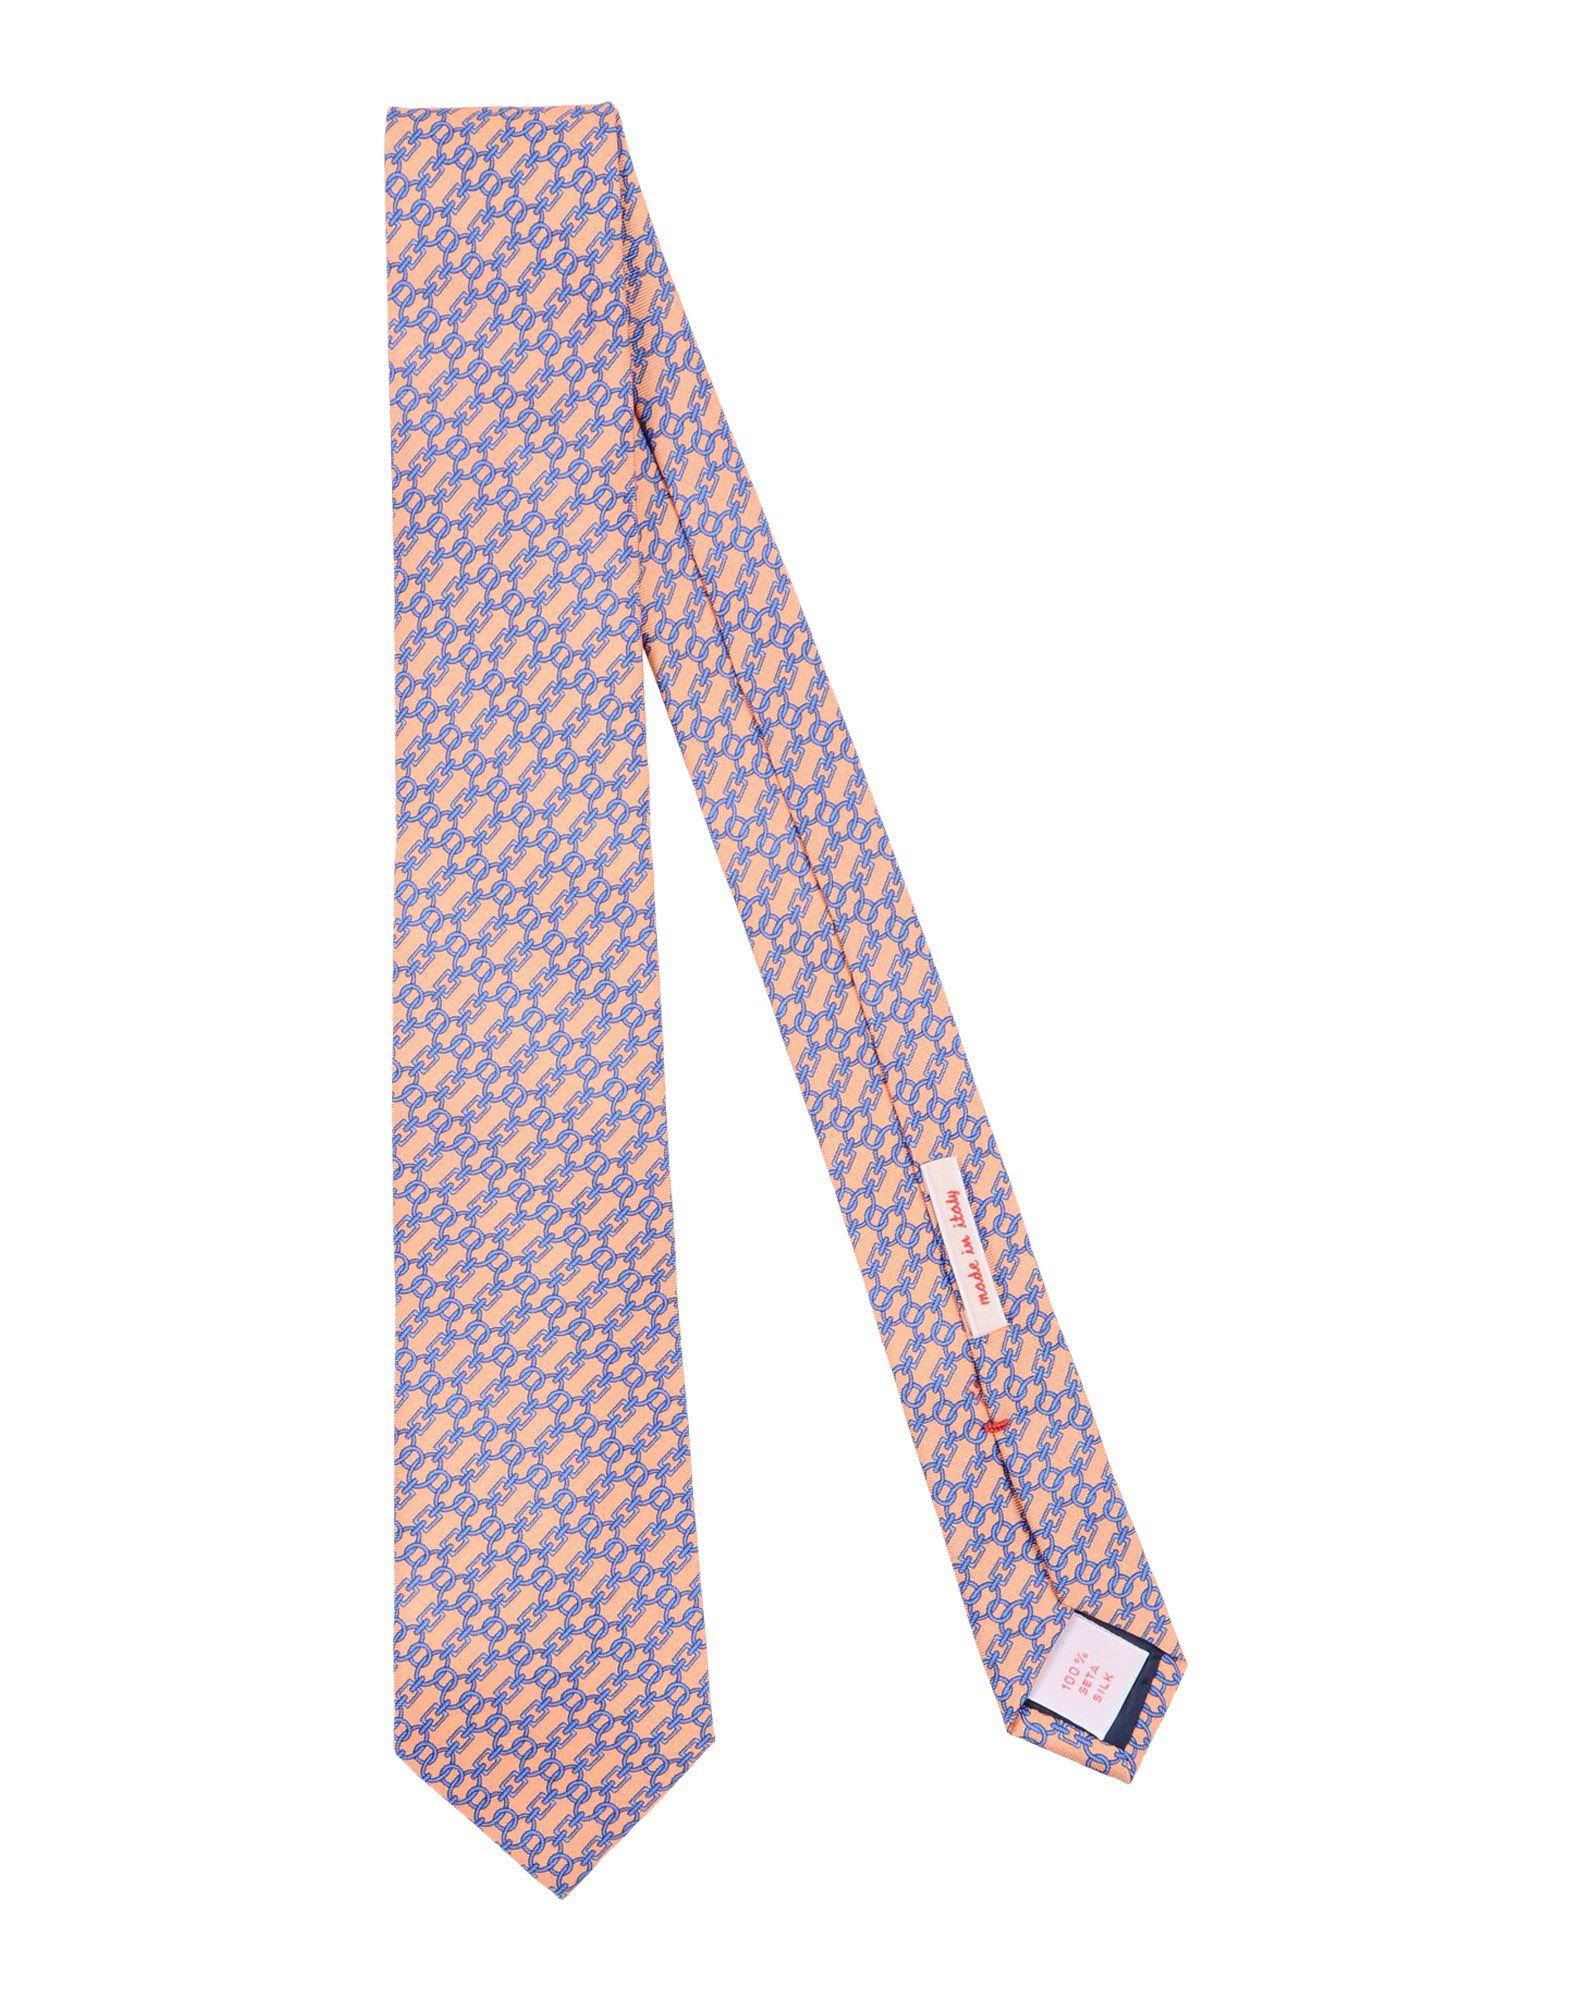 EREDI CHIARINI Галстук eredi chiarini eredi chiarini галстук 154190